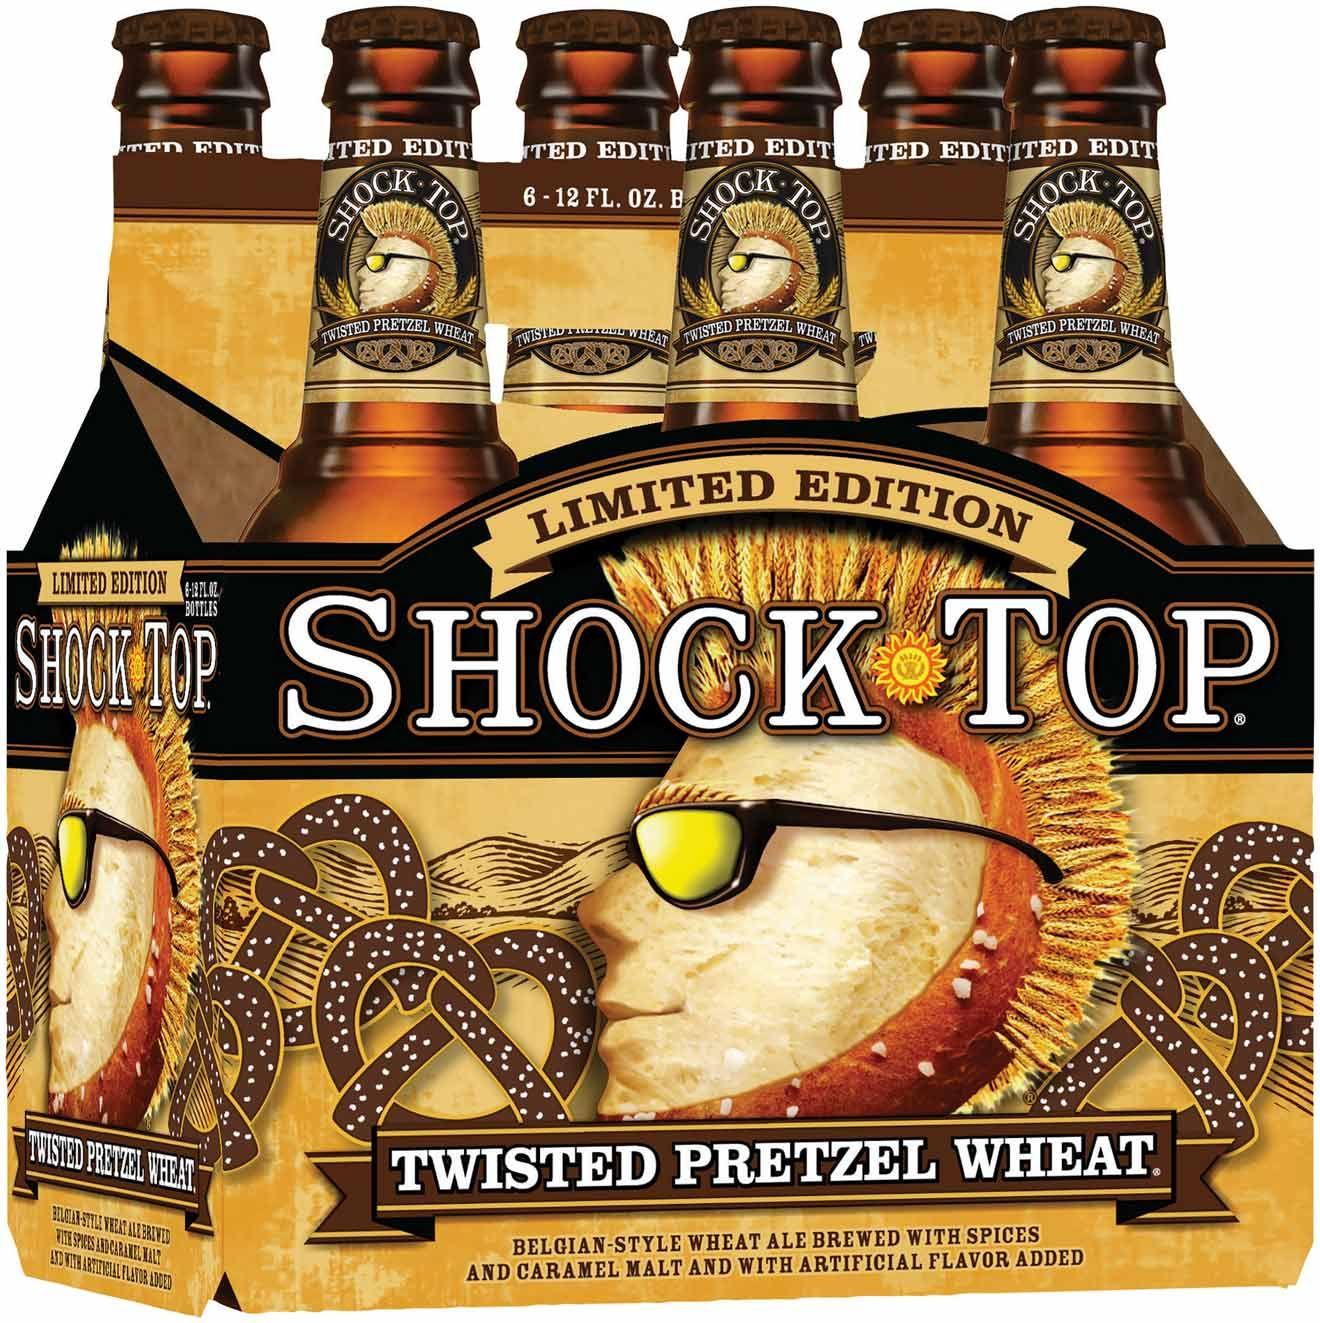 Shock Top Brings Back Twisted Pretzel Wheat | Beer News | Pinterest ...